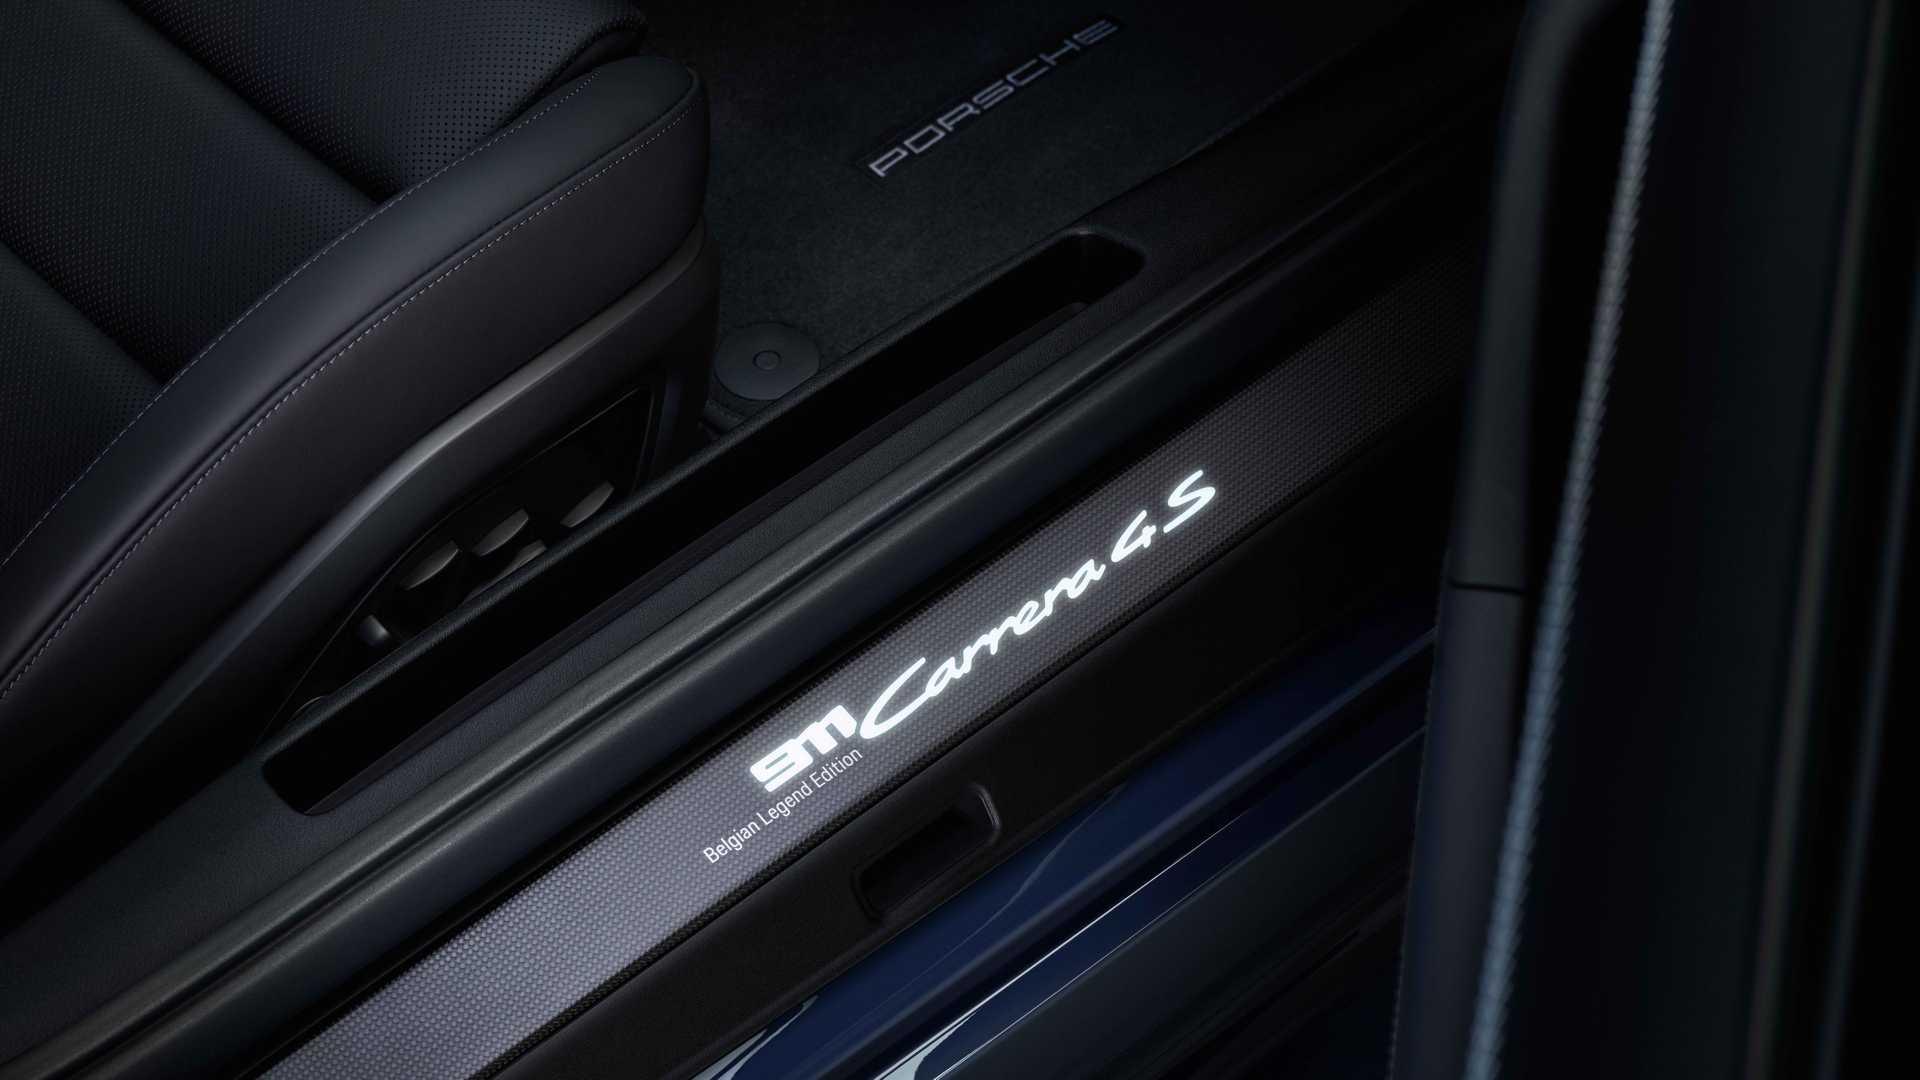 Ra mắt Porsche 911 phiên bản đặc biệt Belgian Legend - 10